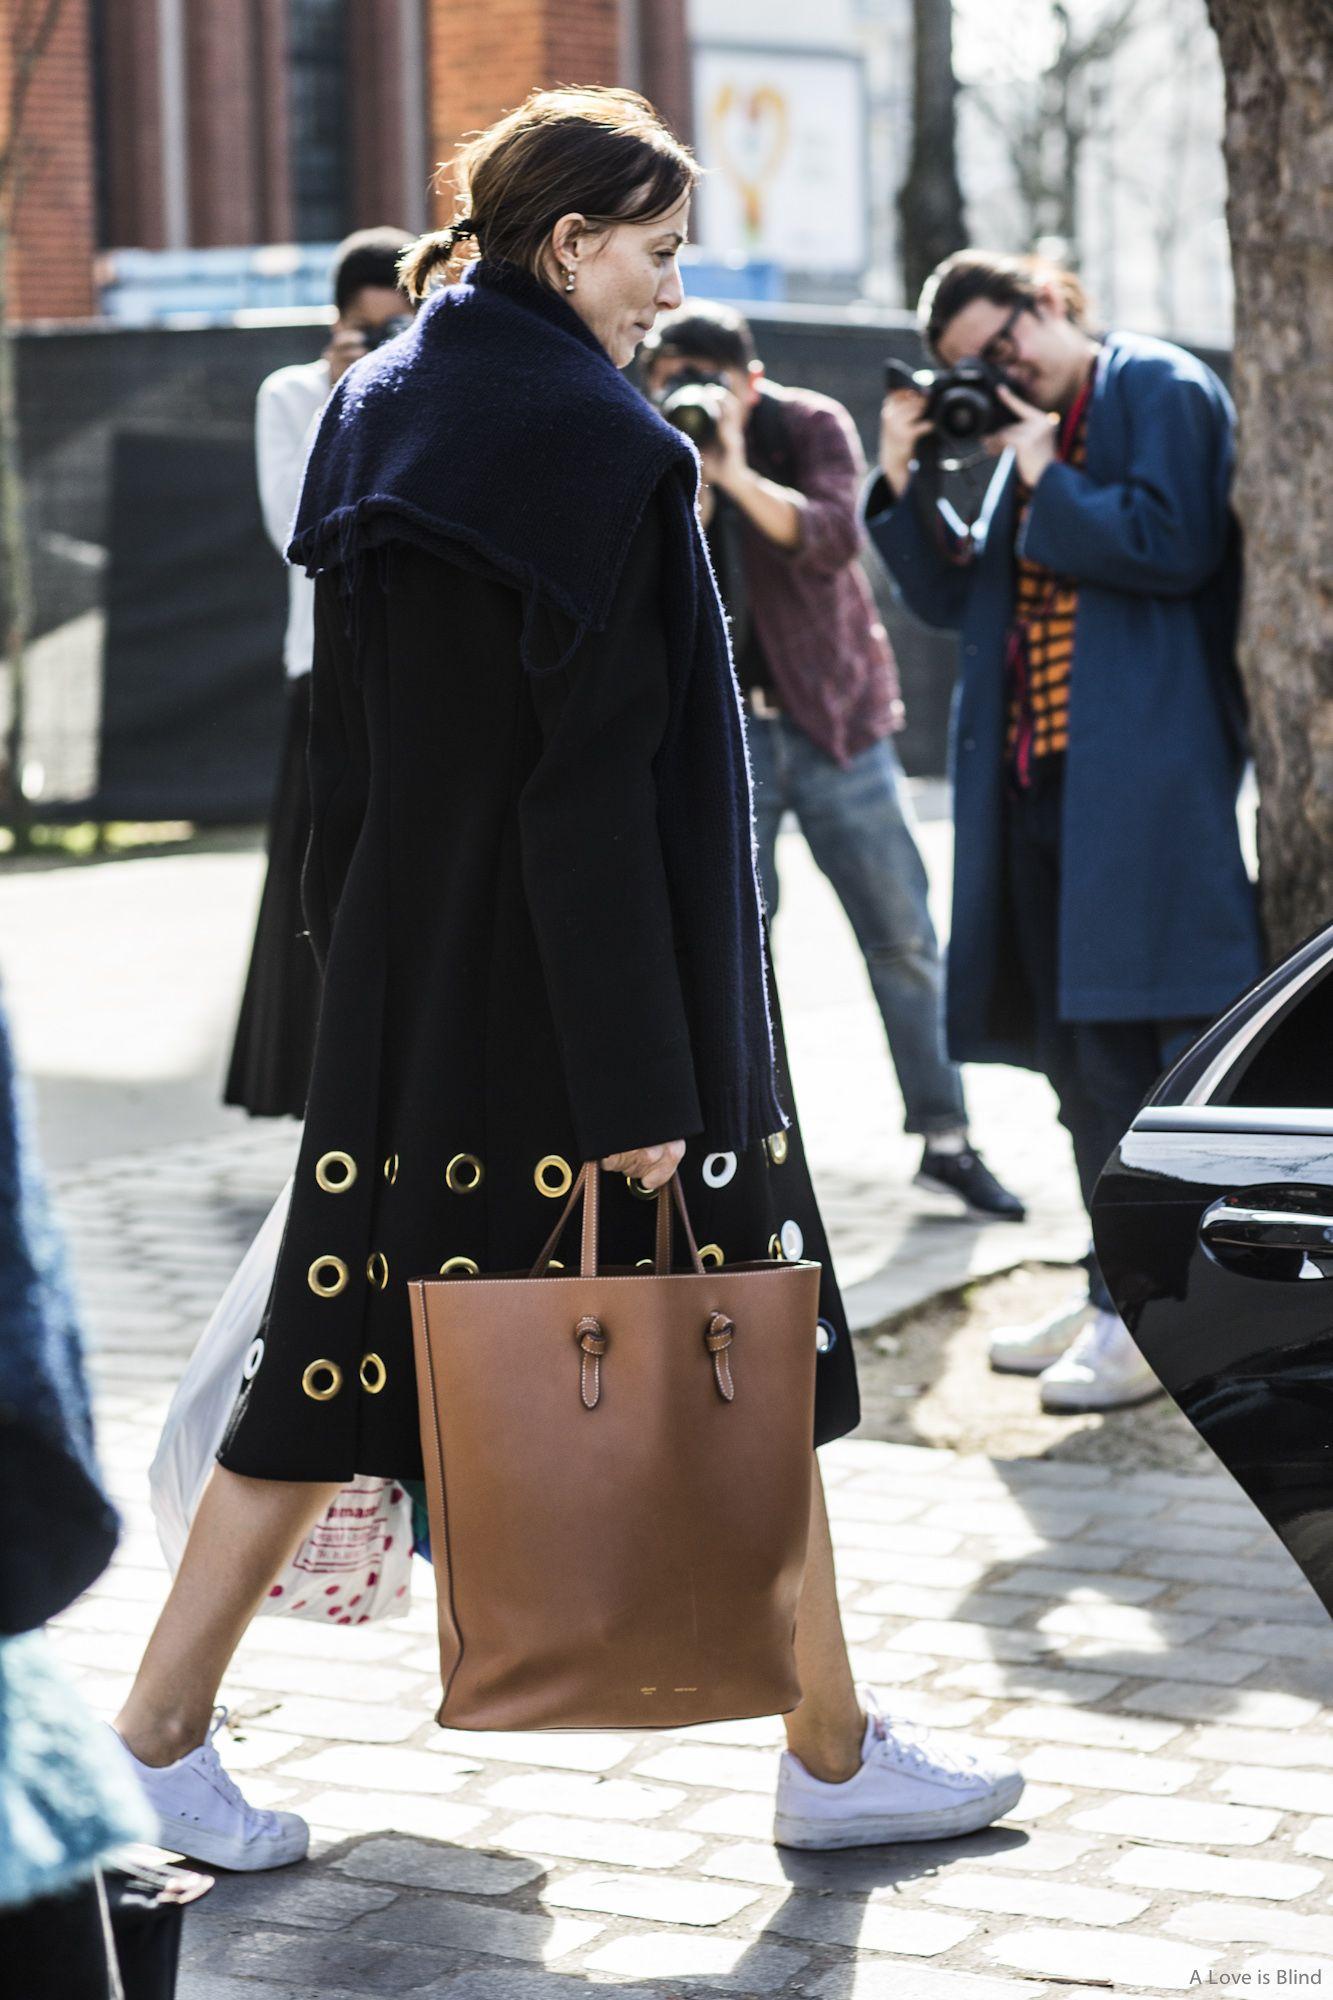 Laid back cool in kicks, Celine tote, mini ponytail.